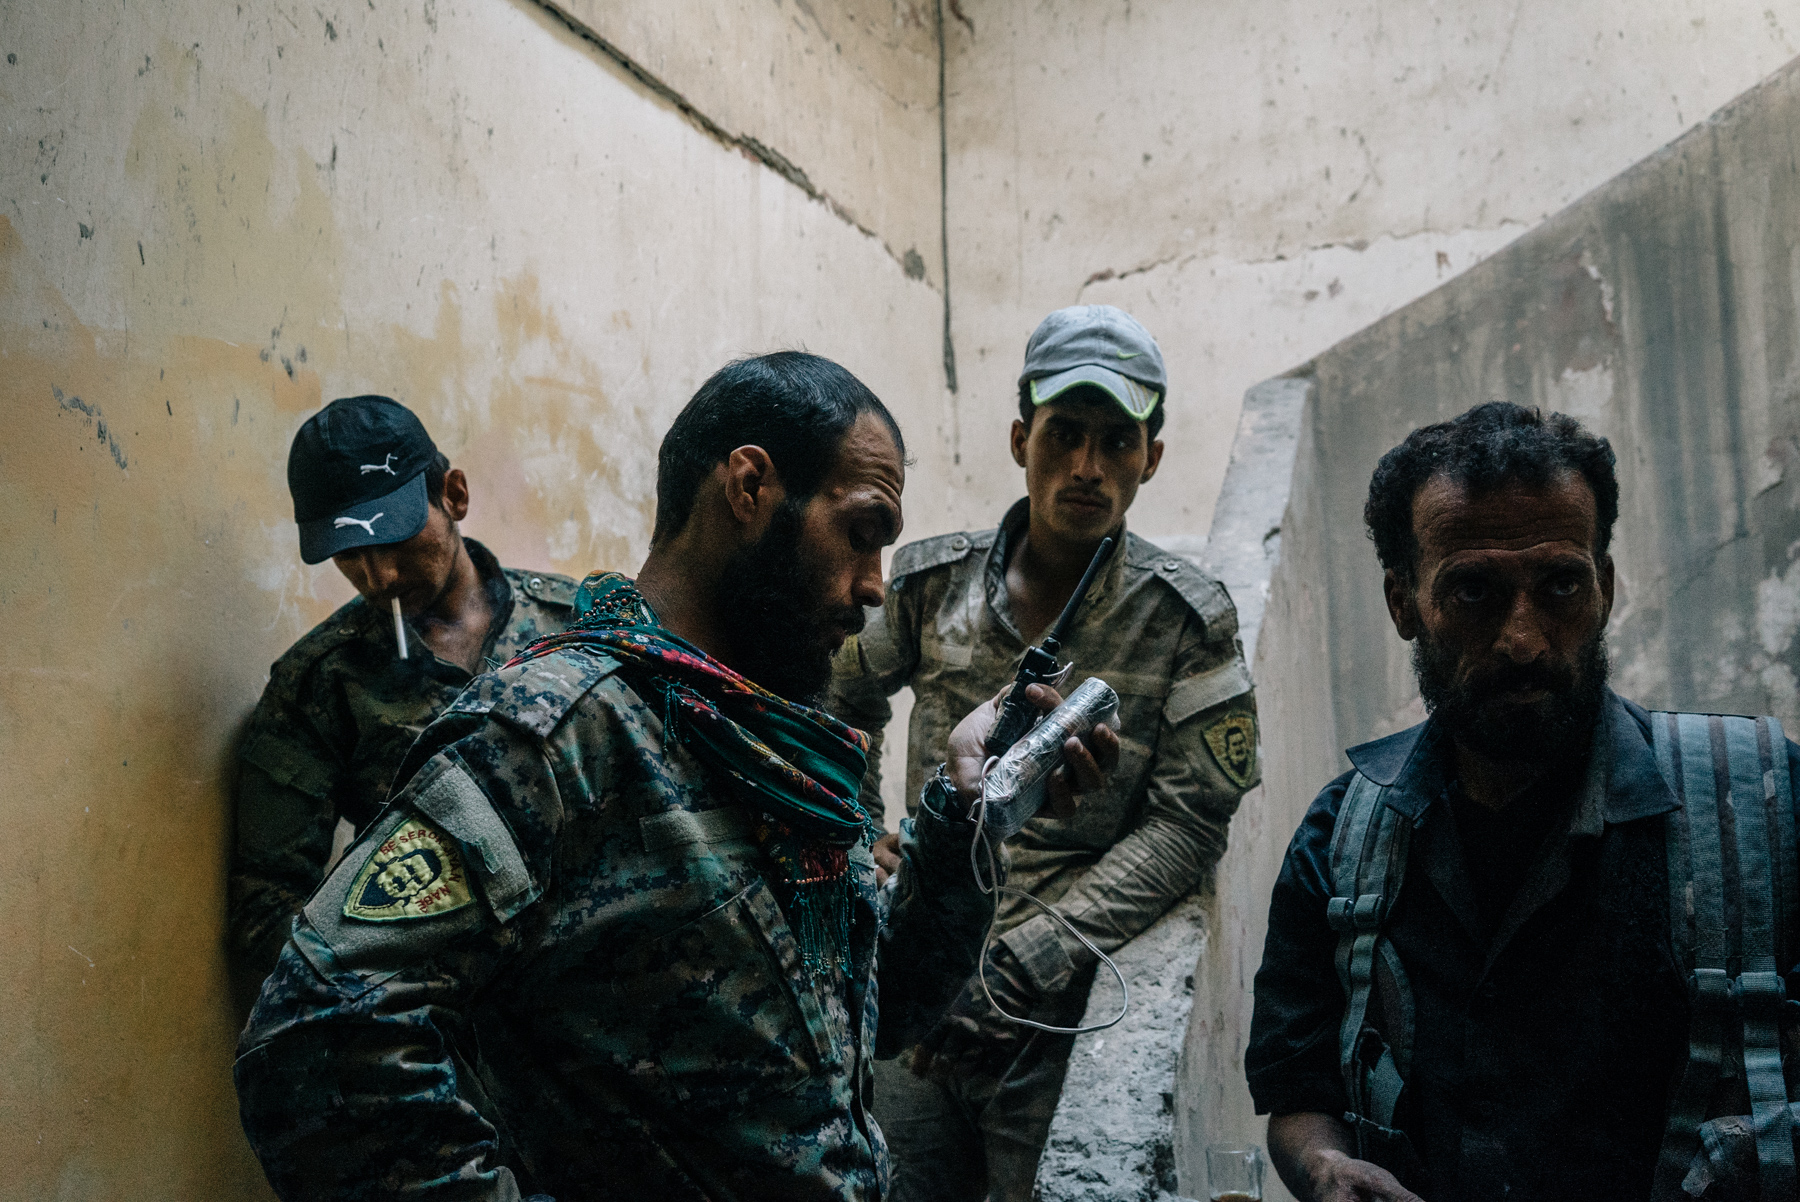 raqqa-syria-september17-01140.jpg